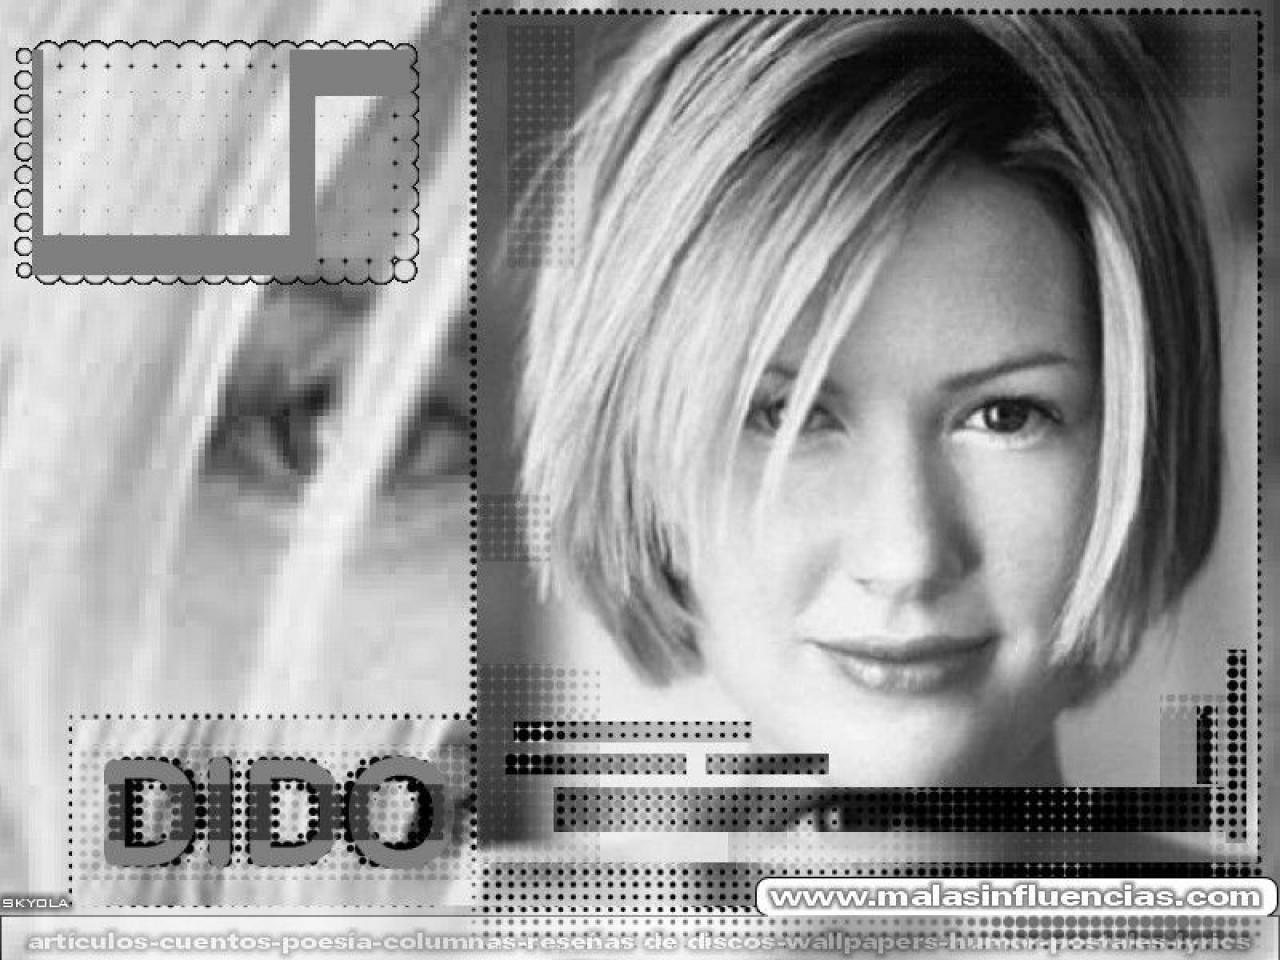 http://4.bp.blogspot.com/-PsE64Ew6KBQ/UL1y2-eZ2LI/AAAAAAAAORI/Q276ZZZlcuI/s1600/dido-armstrong-wallpapers01.jpg